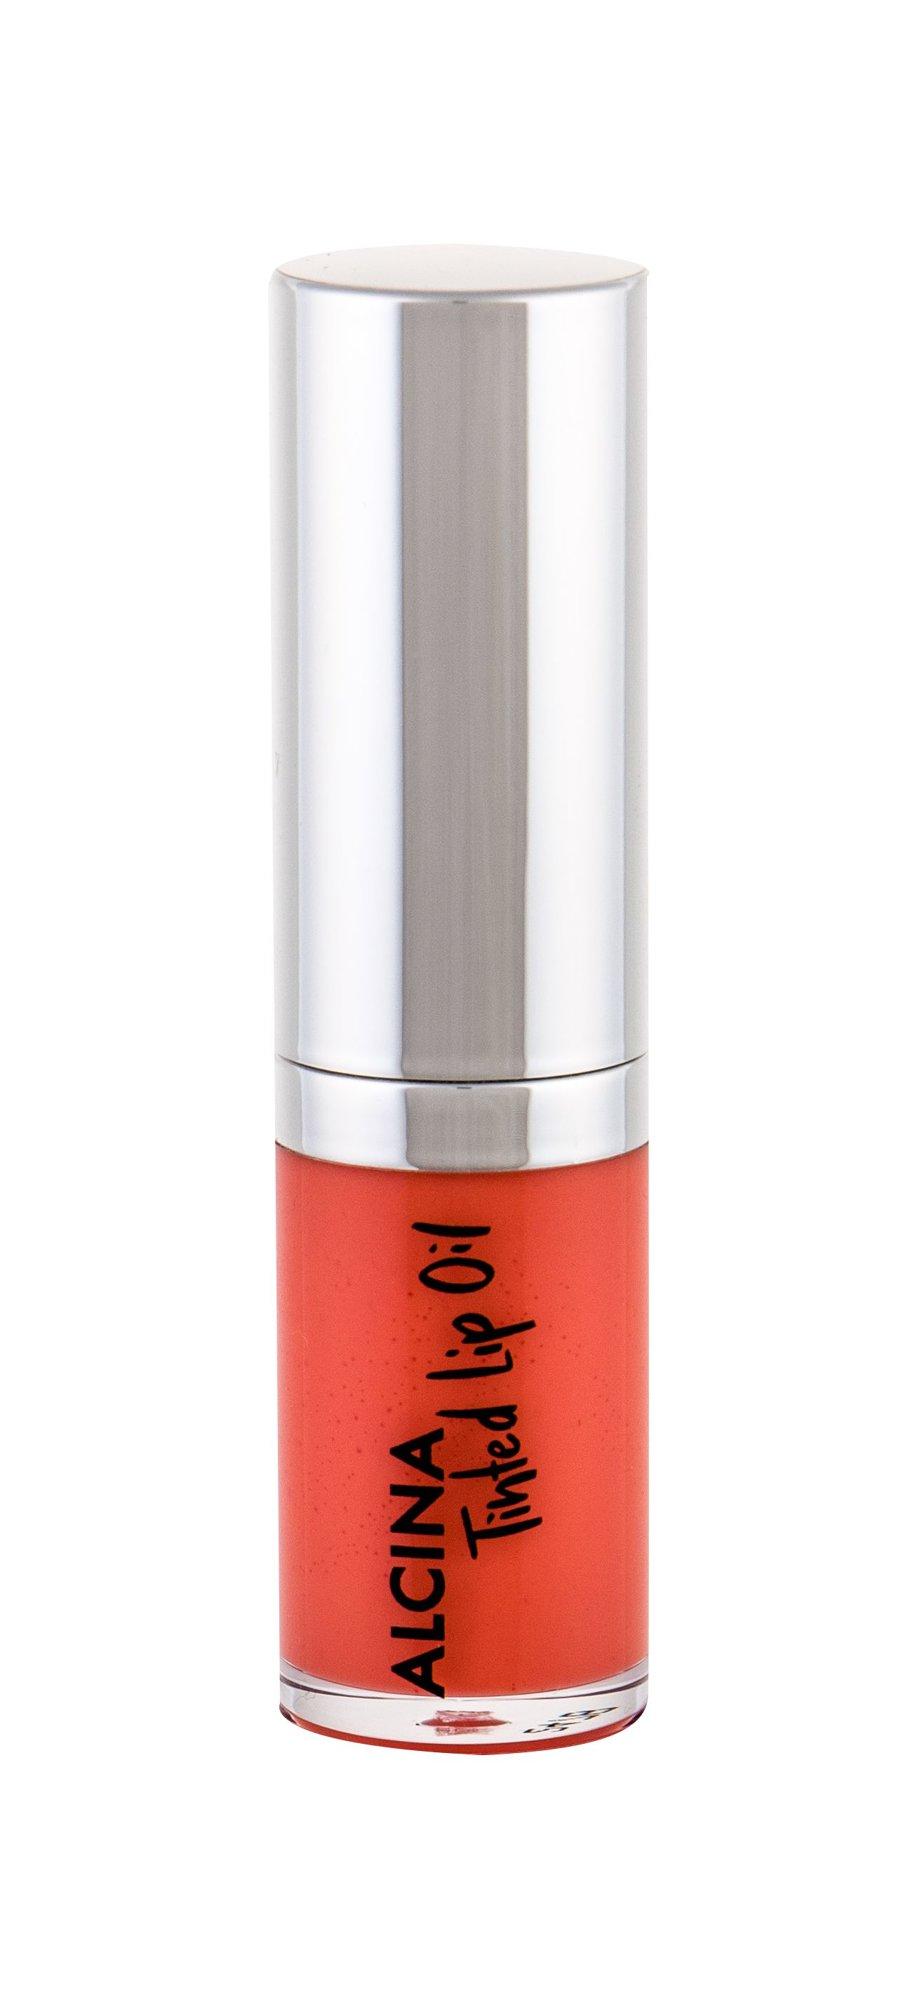 ALCINA Tinted Lip Oil Lip Gloss 5ml Peach